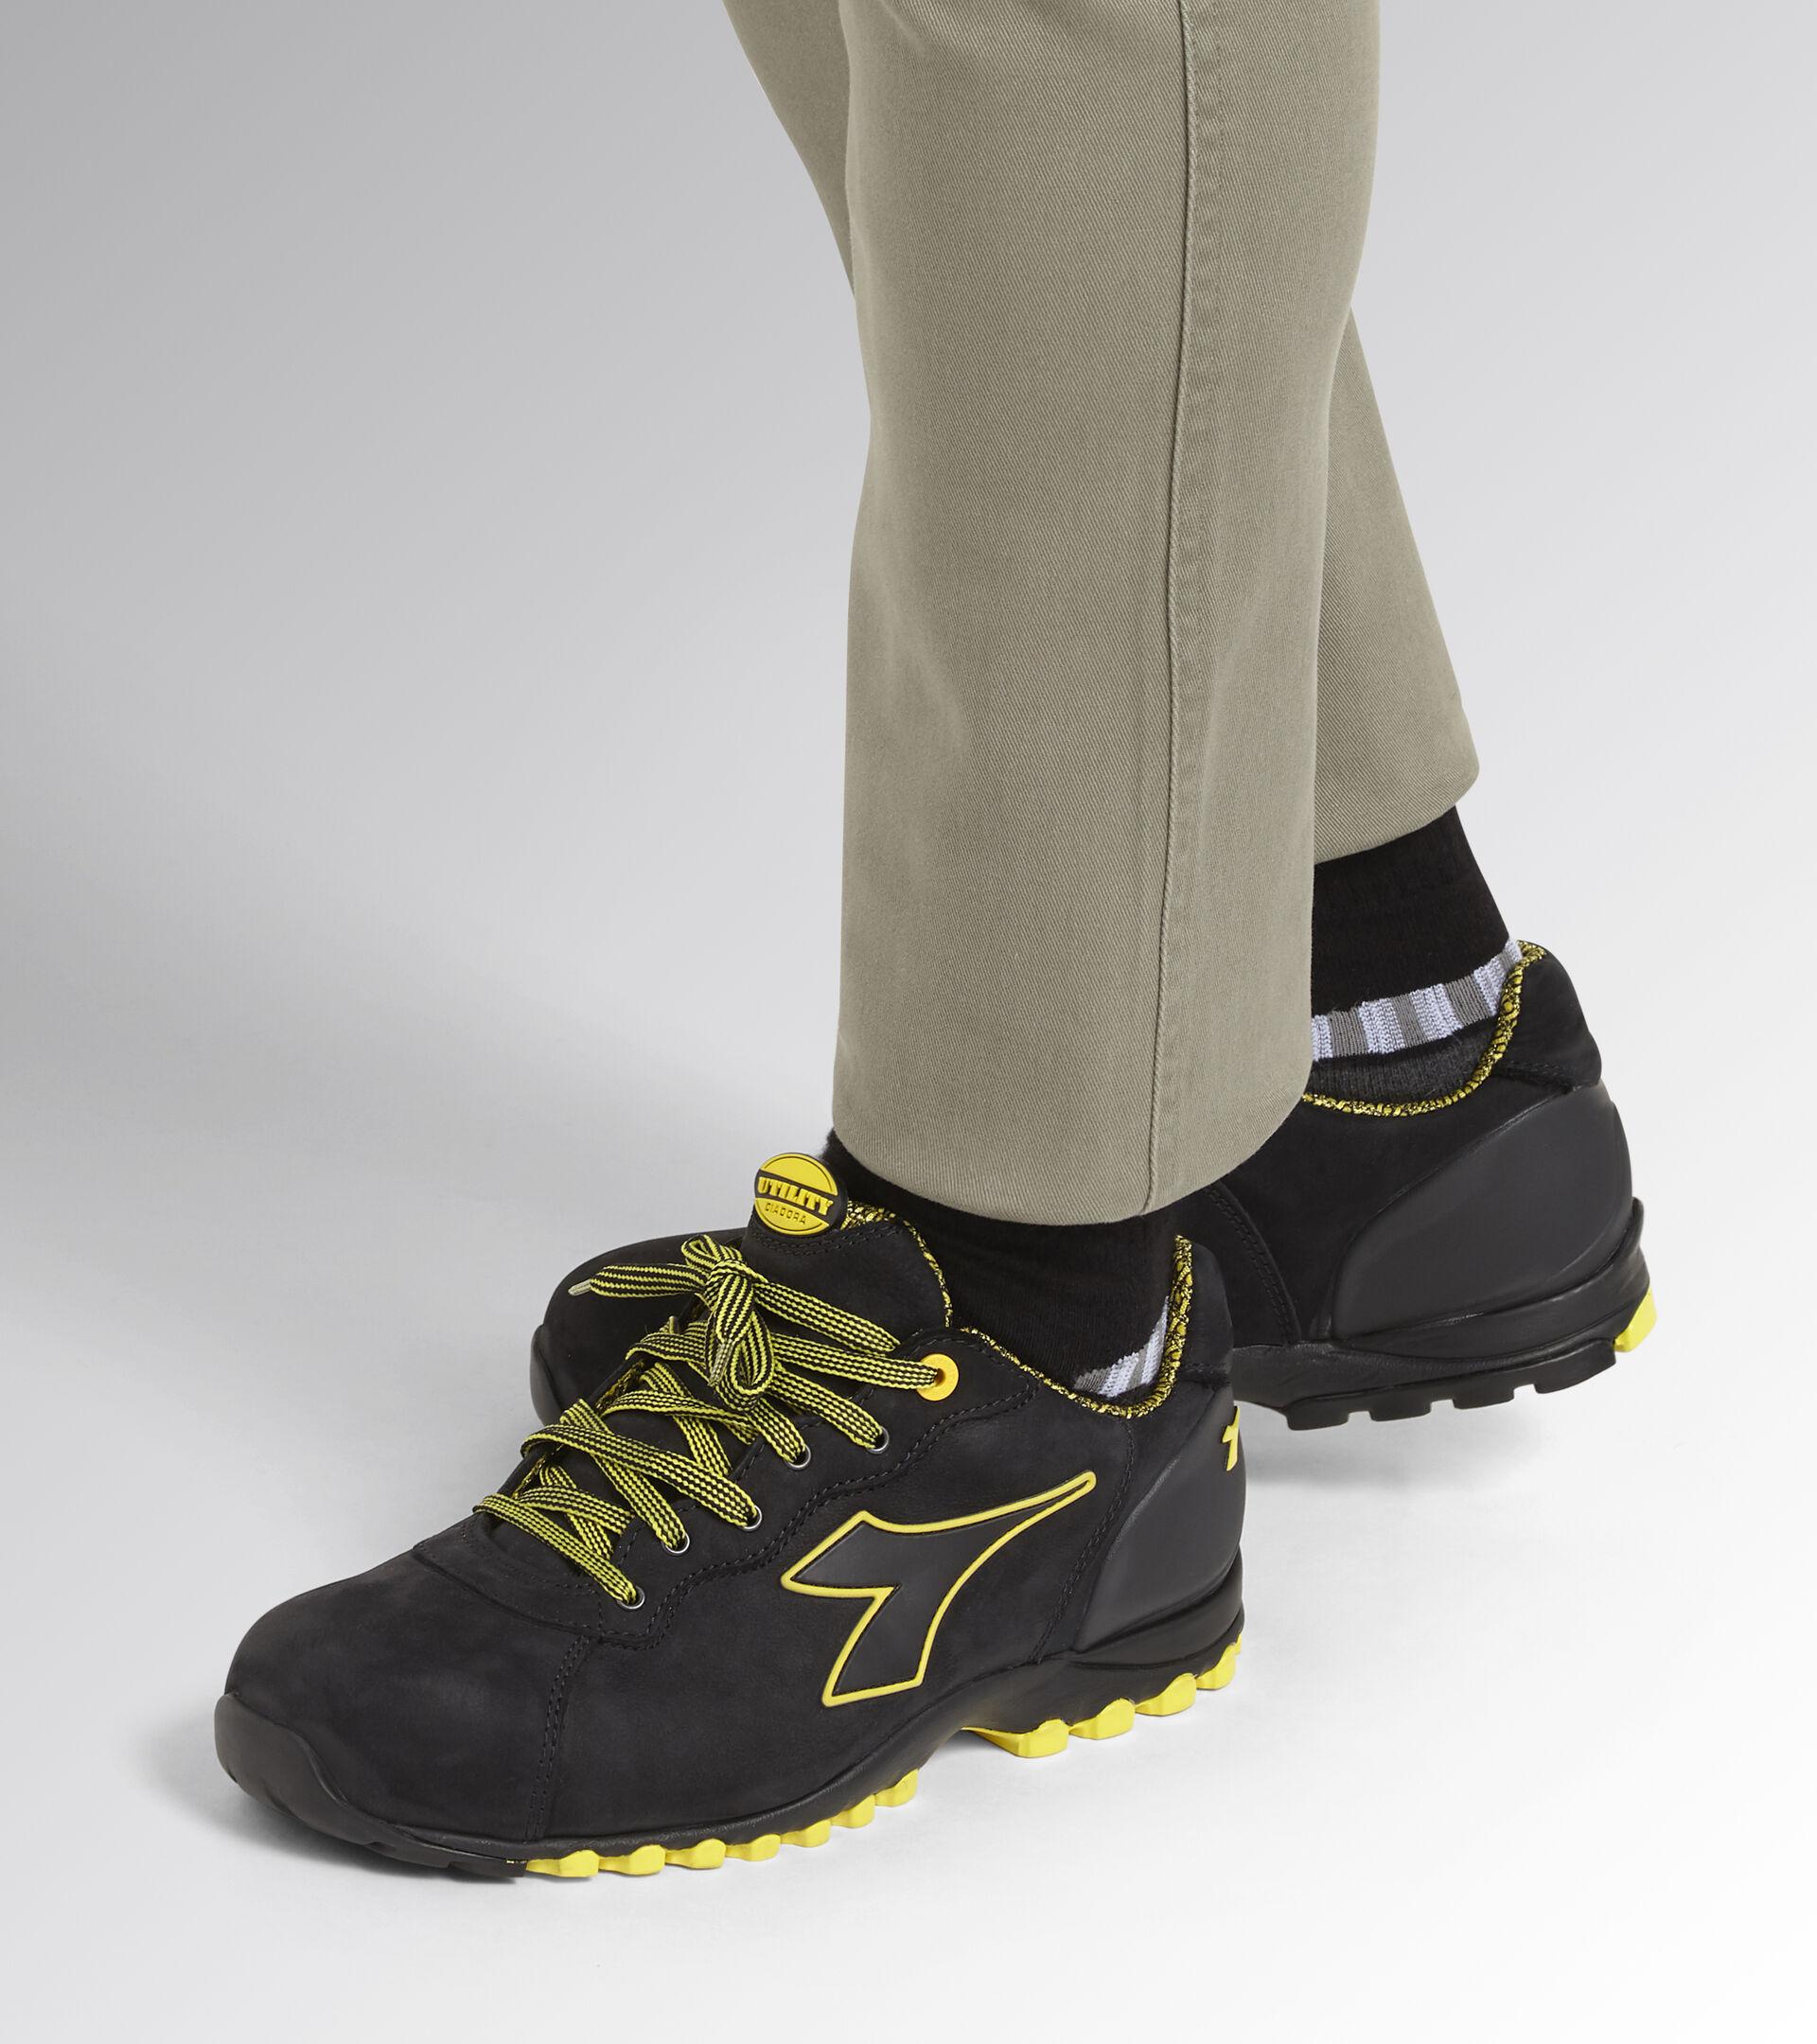 Footwear Utility UNISEX BEAT DA2 LOW S3 HRO SRC SCHWARZ Utility